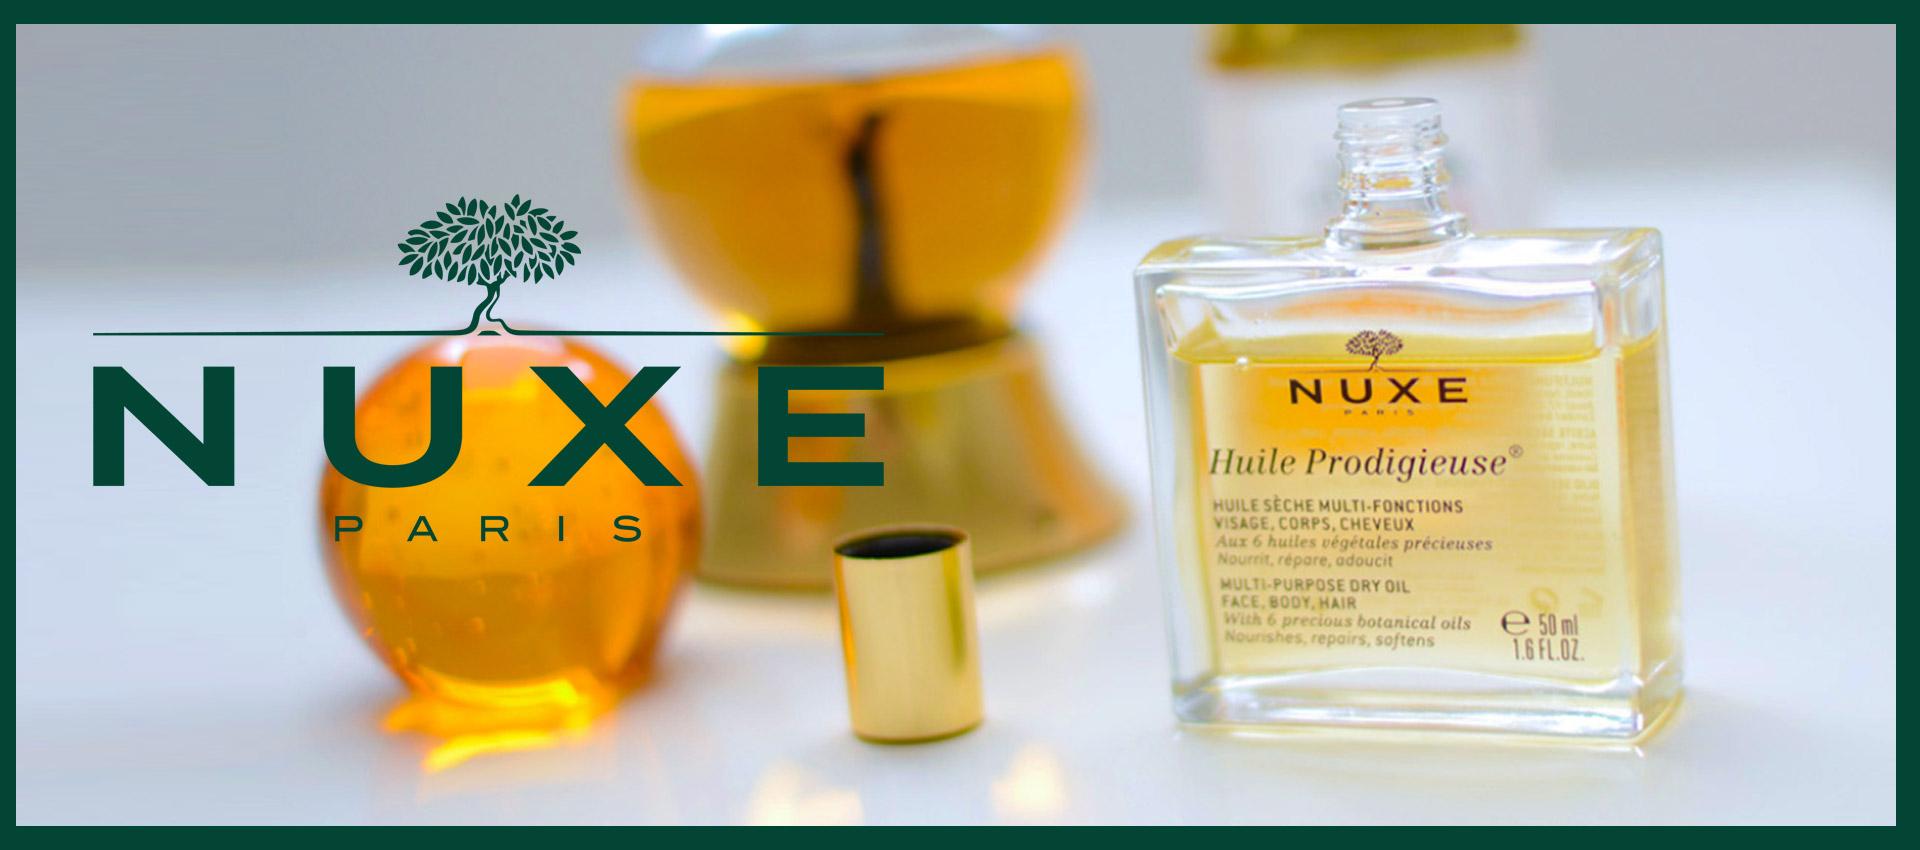 nuxe-new-banner.jpg